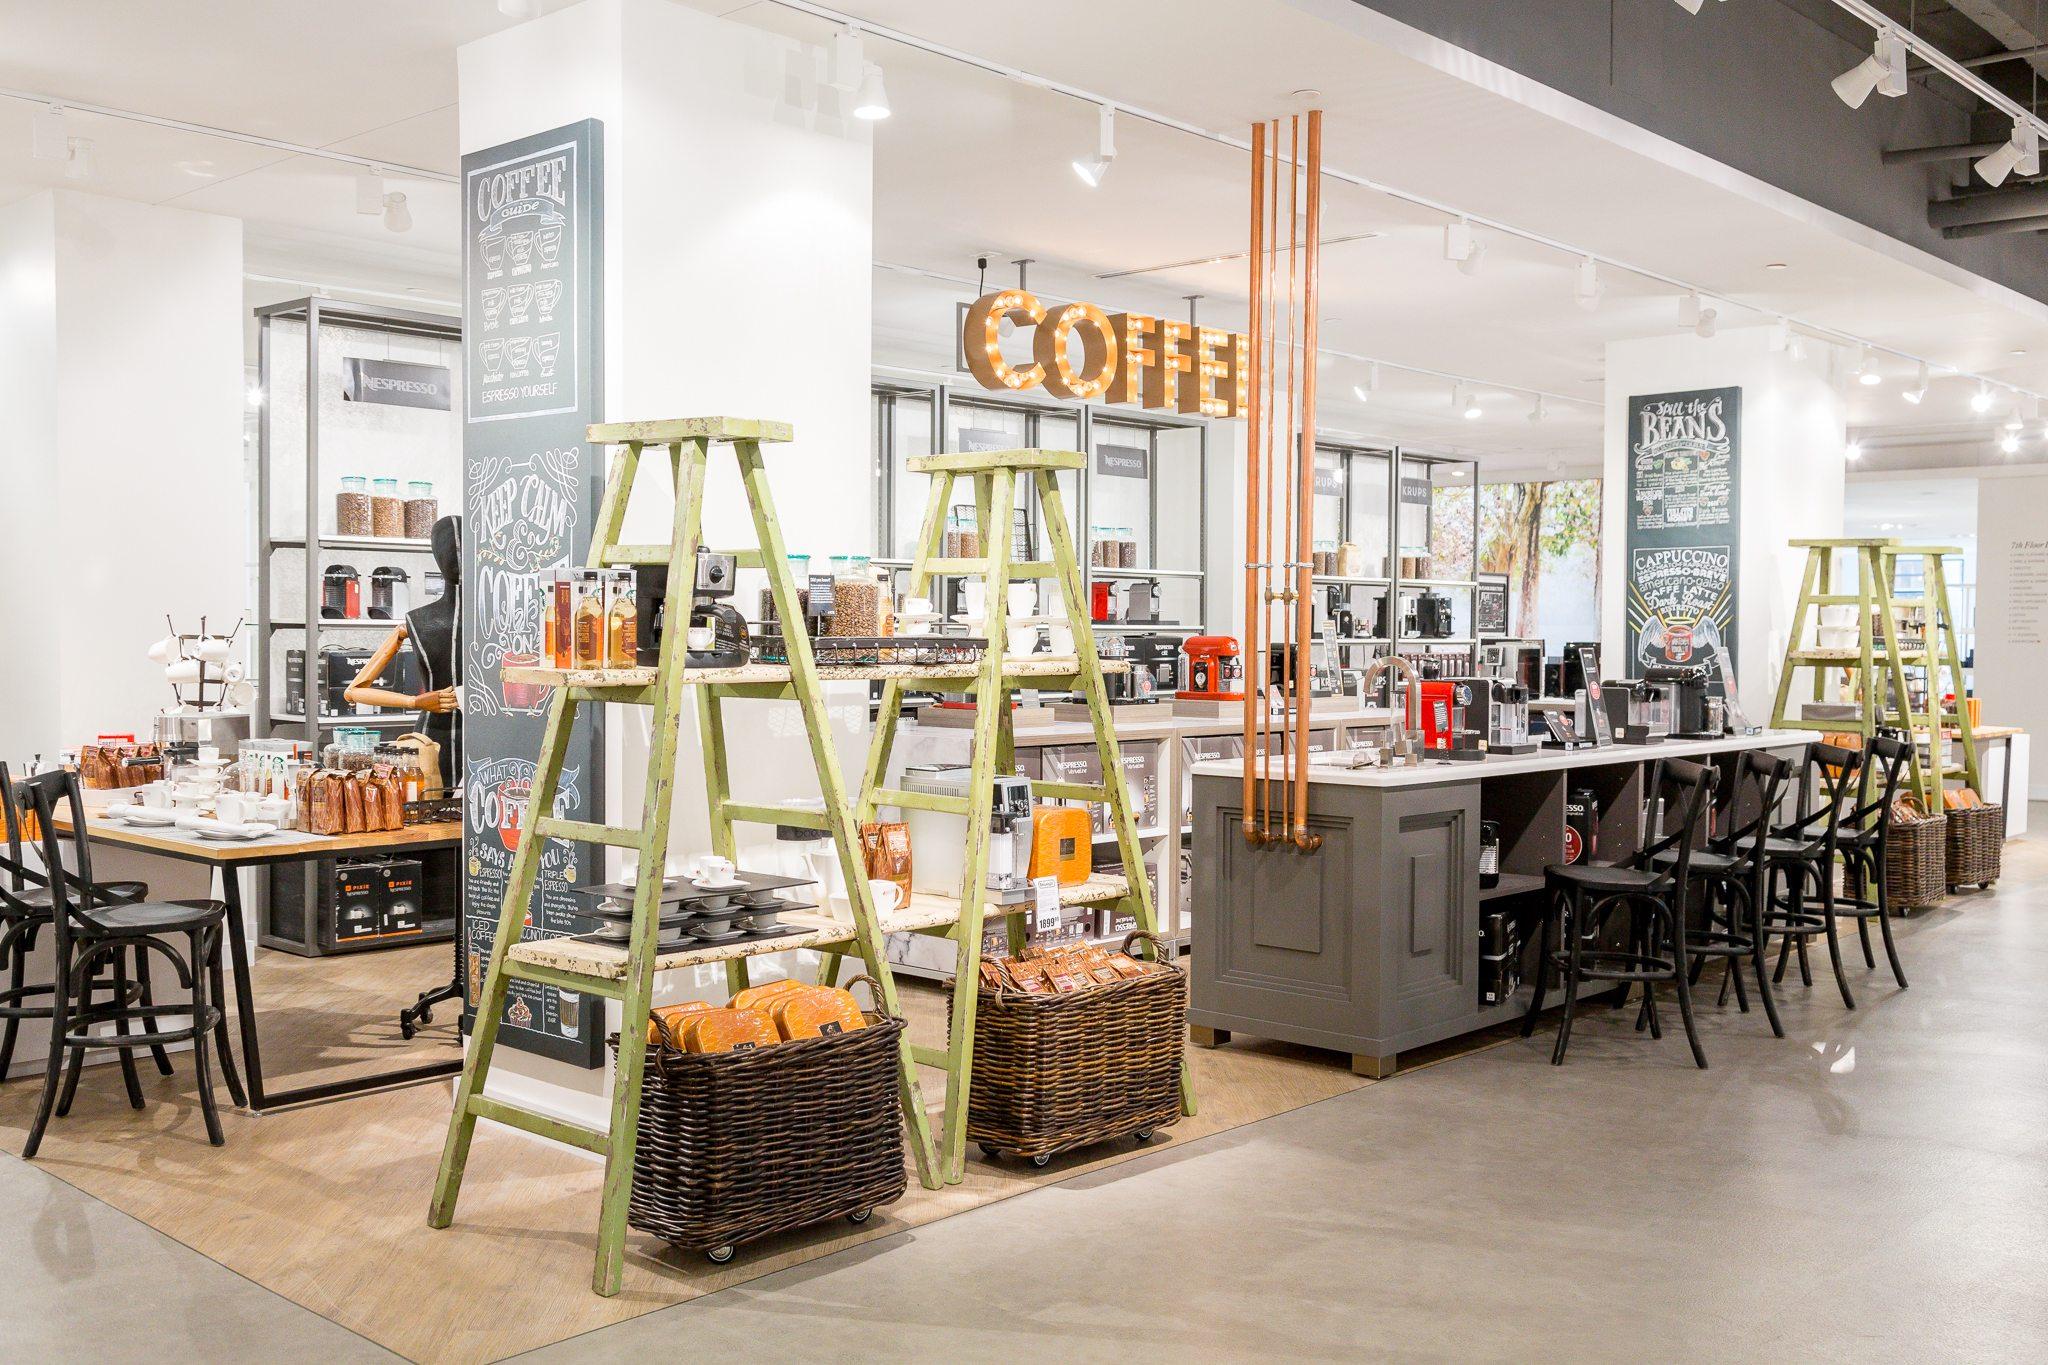 International Housewares Association Ladders In Retail Displays